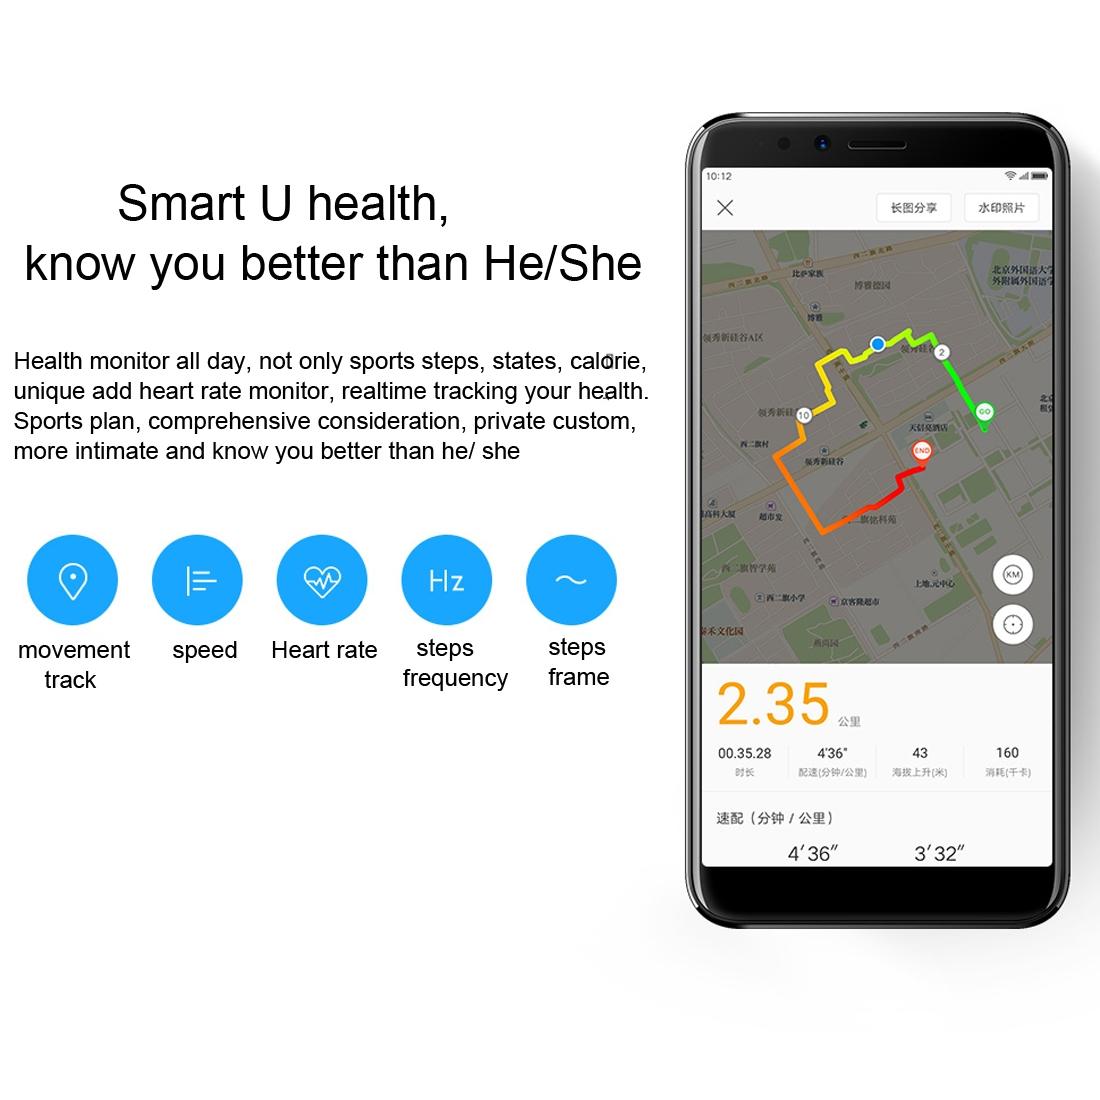 i.ibb.co/mBd7dhr/Smartphone-3-GB-32-GB-Jogo-Lenovo-K5-Play-Azul-13.jpg